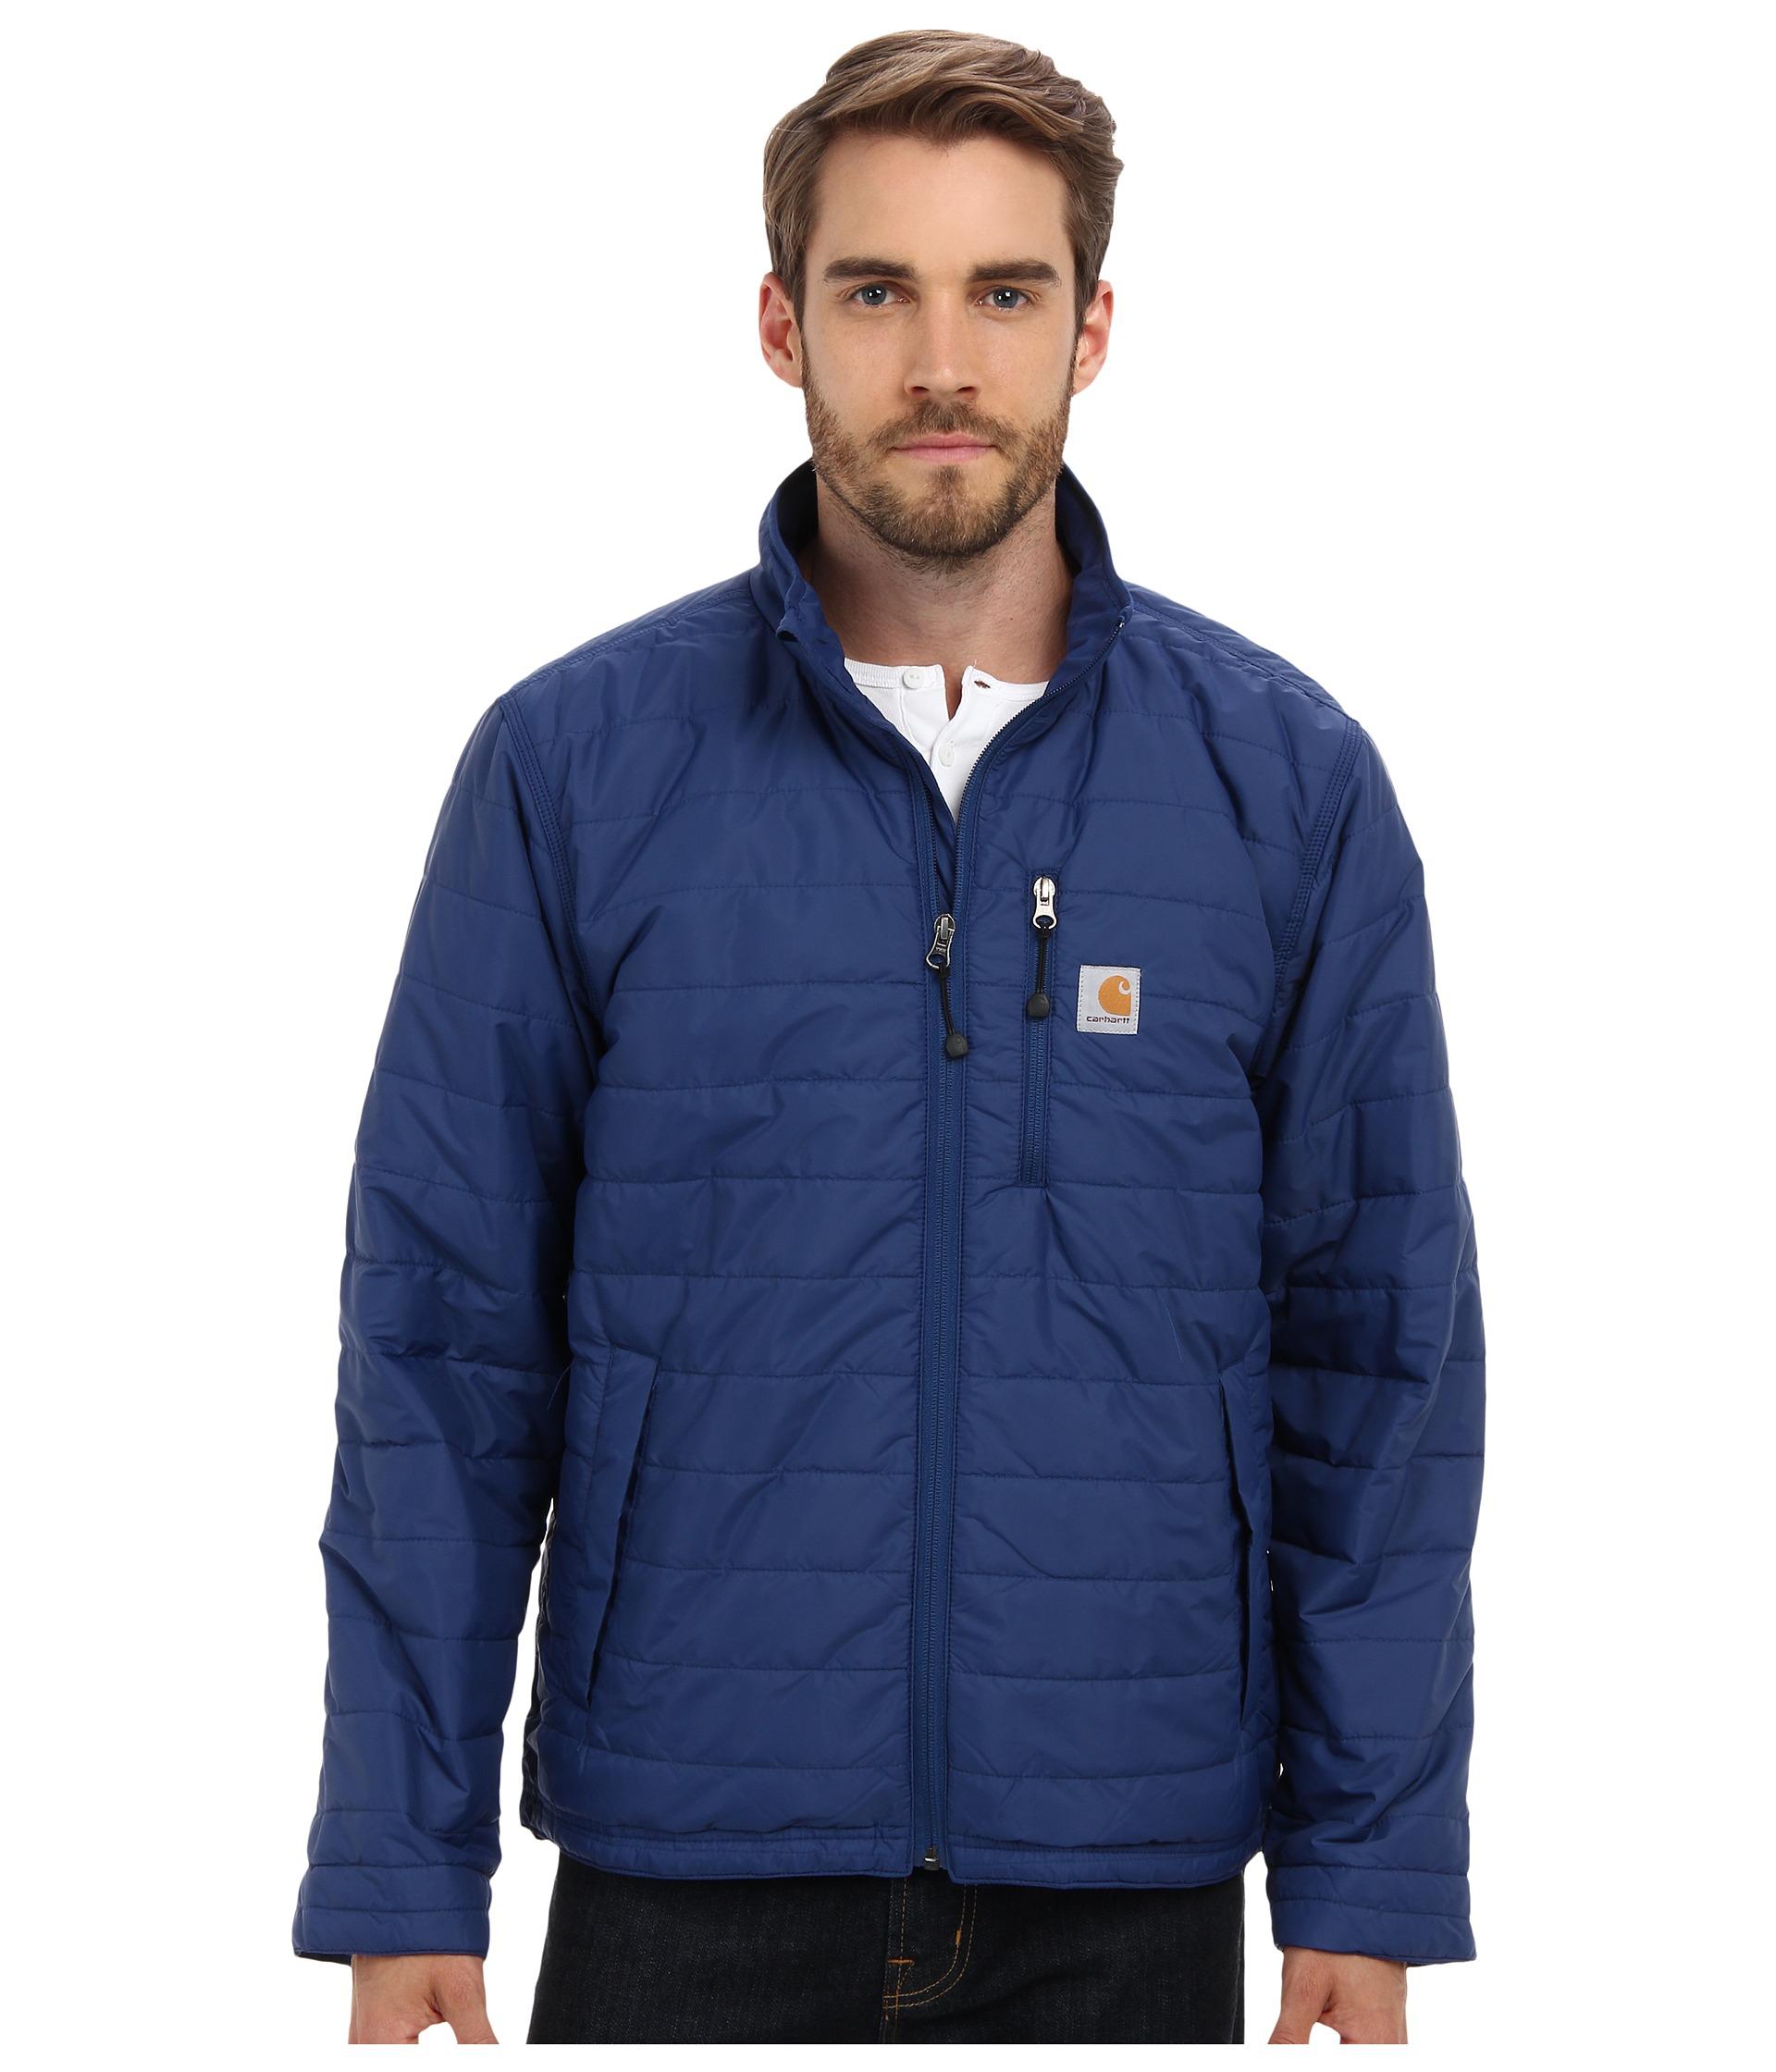 Lyst - Carhartt Gilliam Jacket in Blue for Men